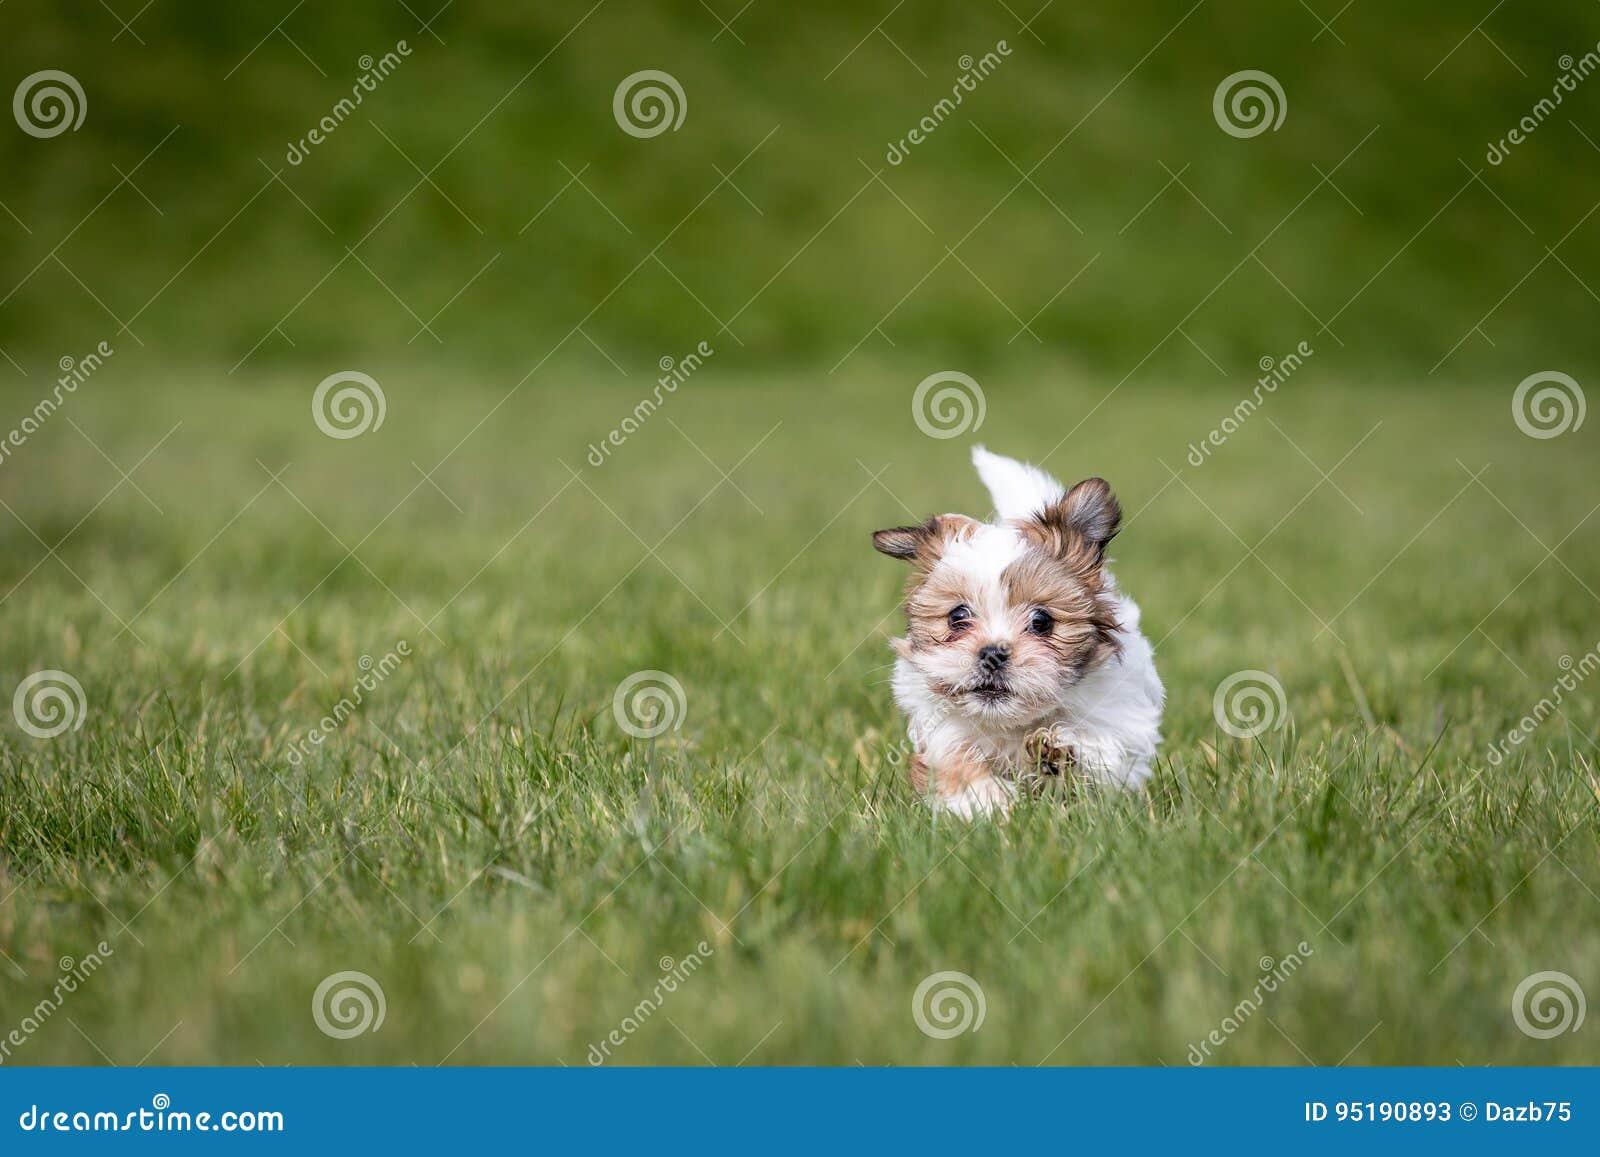 Shih Tzu Puppy Stock Image Image Of Purebred Cute Brown 95190893